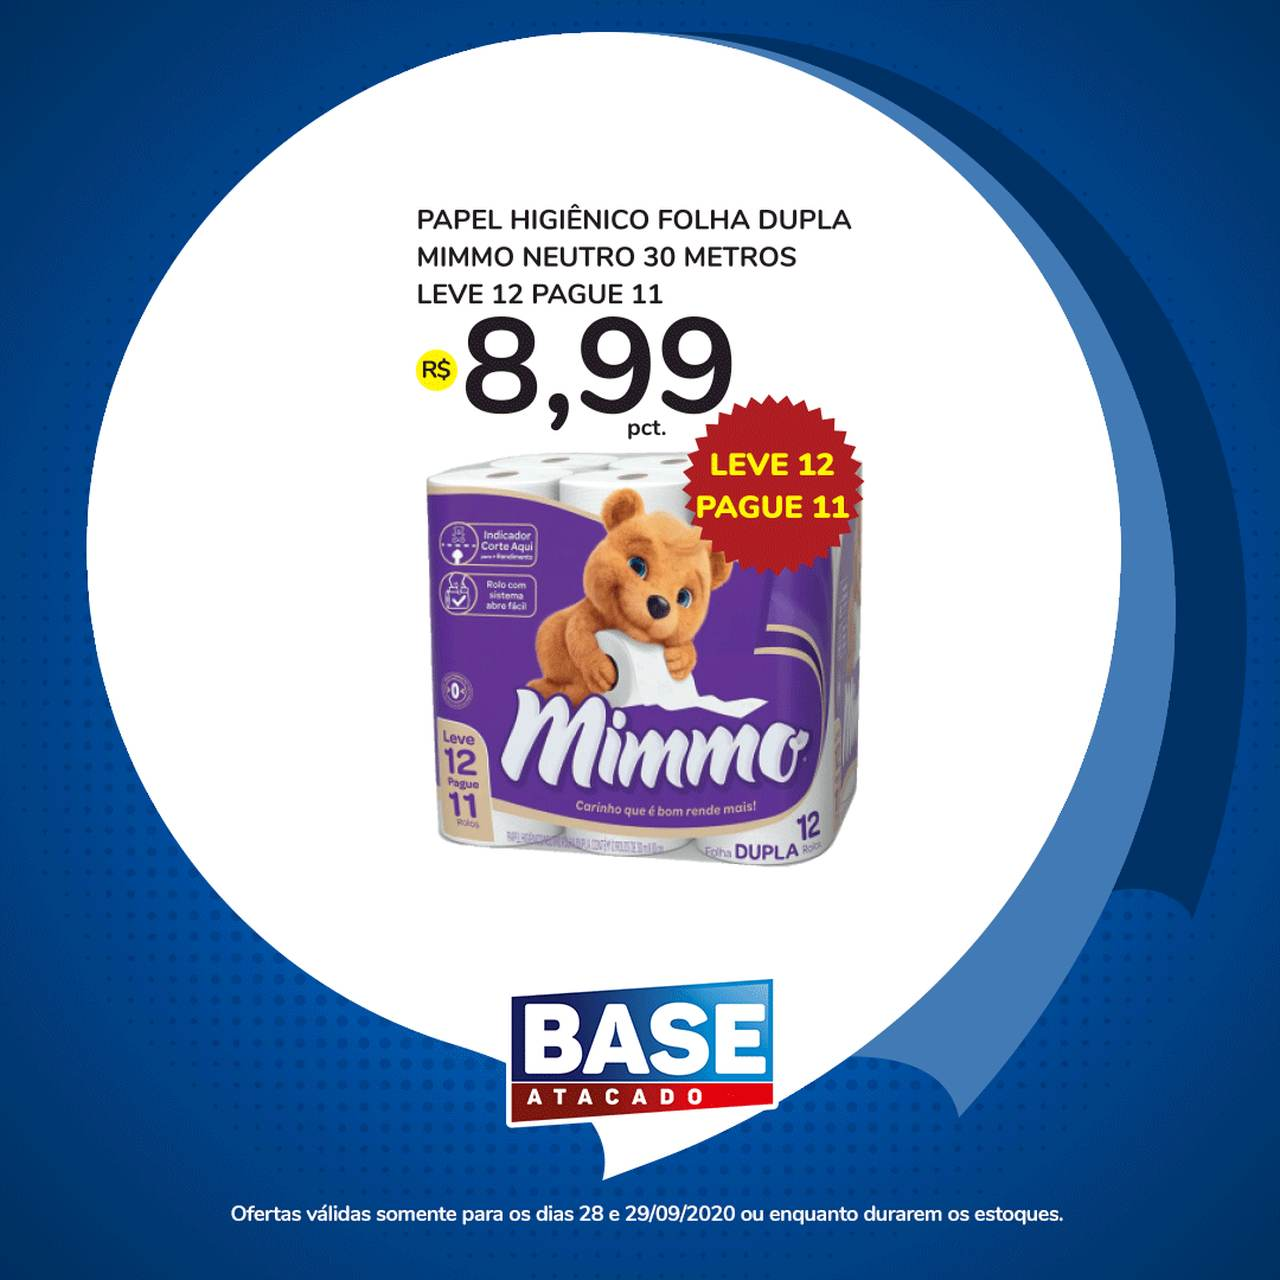 Ofertas de supermercado BASE atacado segunda e terça de super ofertas vence 29-09-4